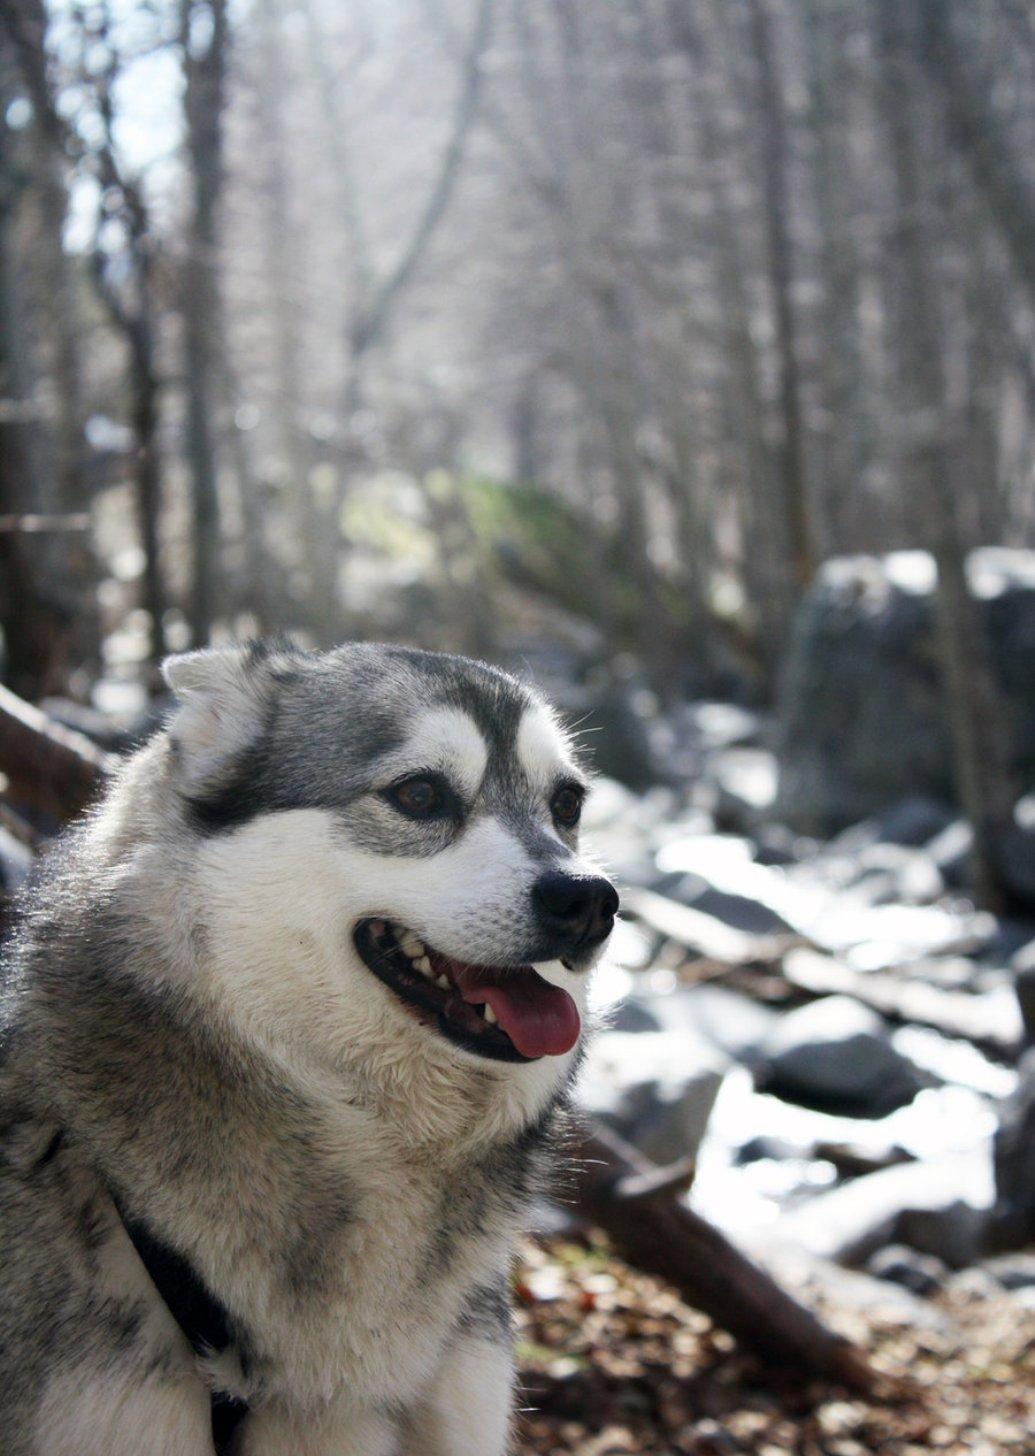 Alaskan Klee Kai winter in the forest wallpaper